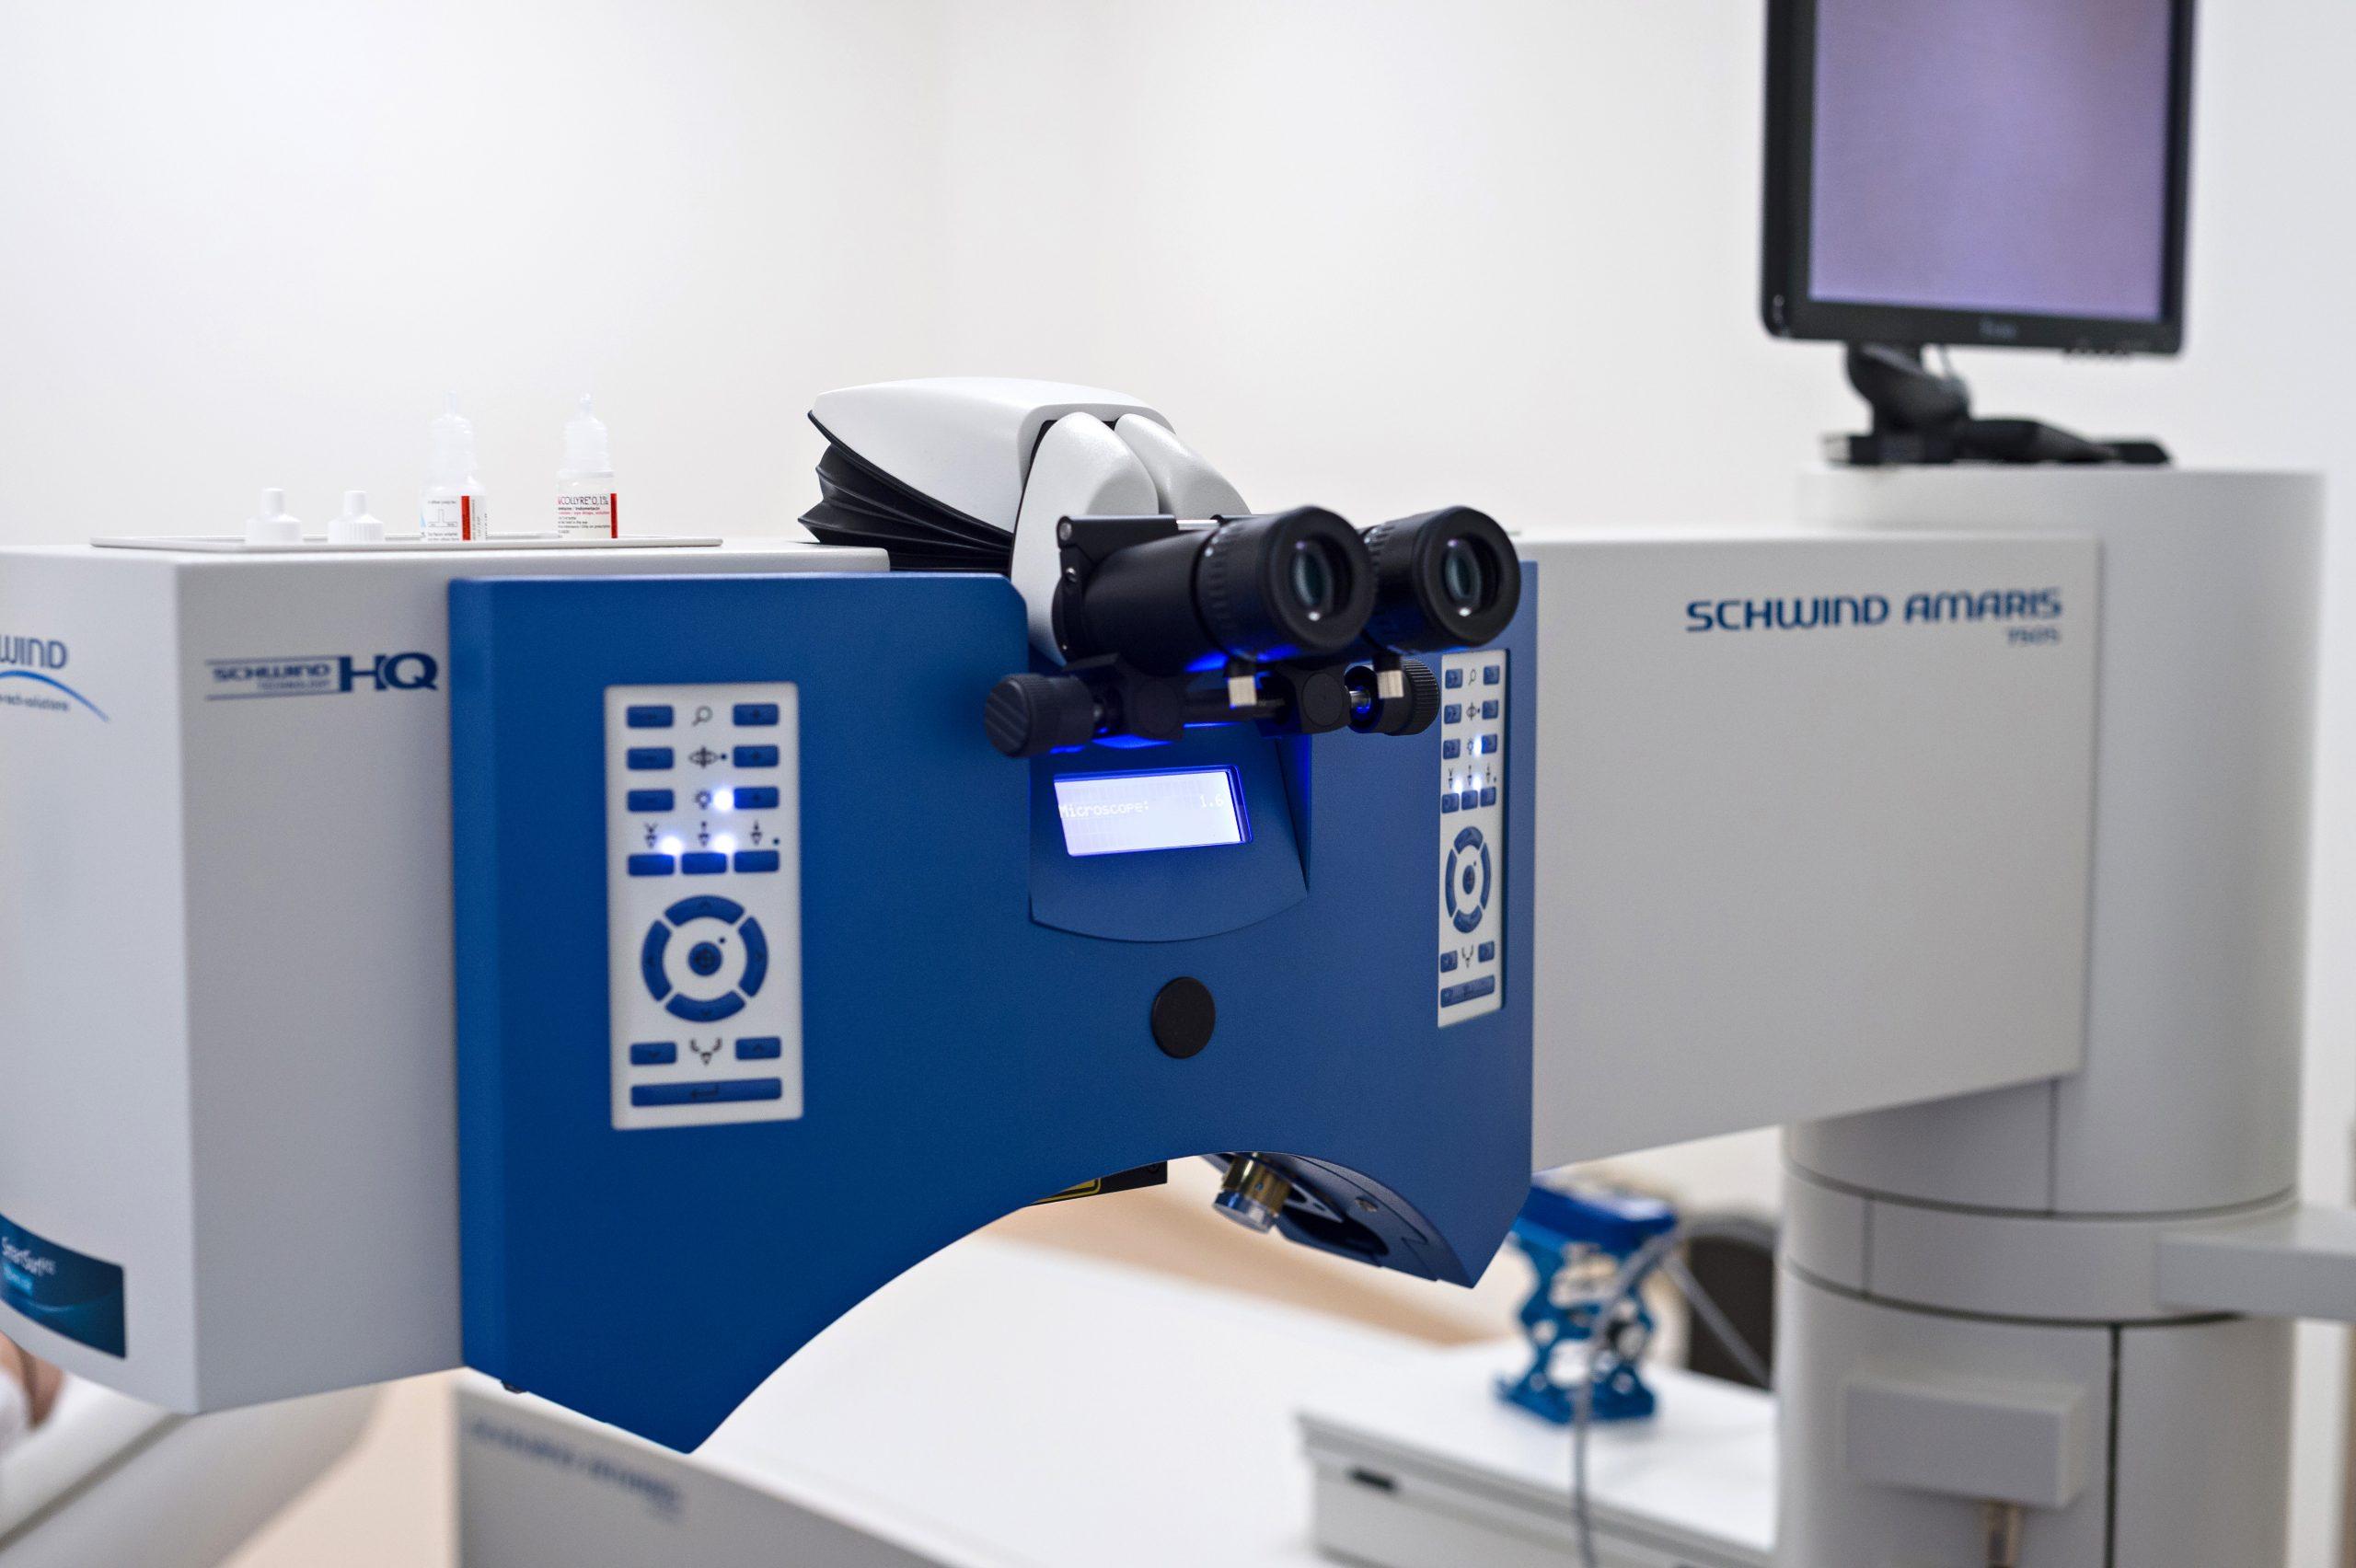 Laser Schwind Amaris 750S opération des yeux